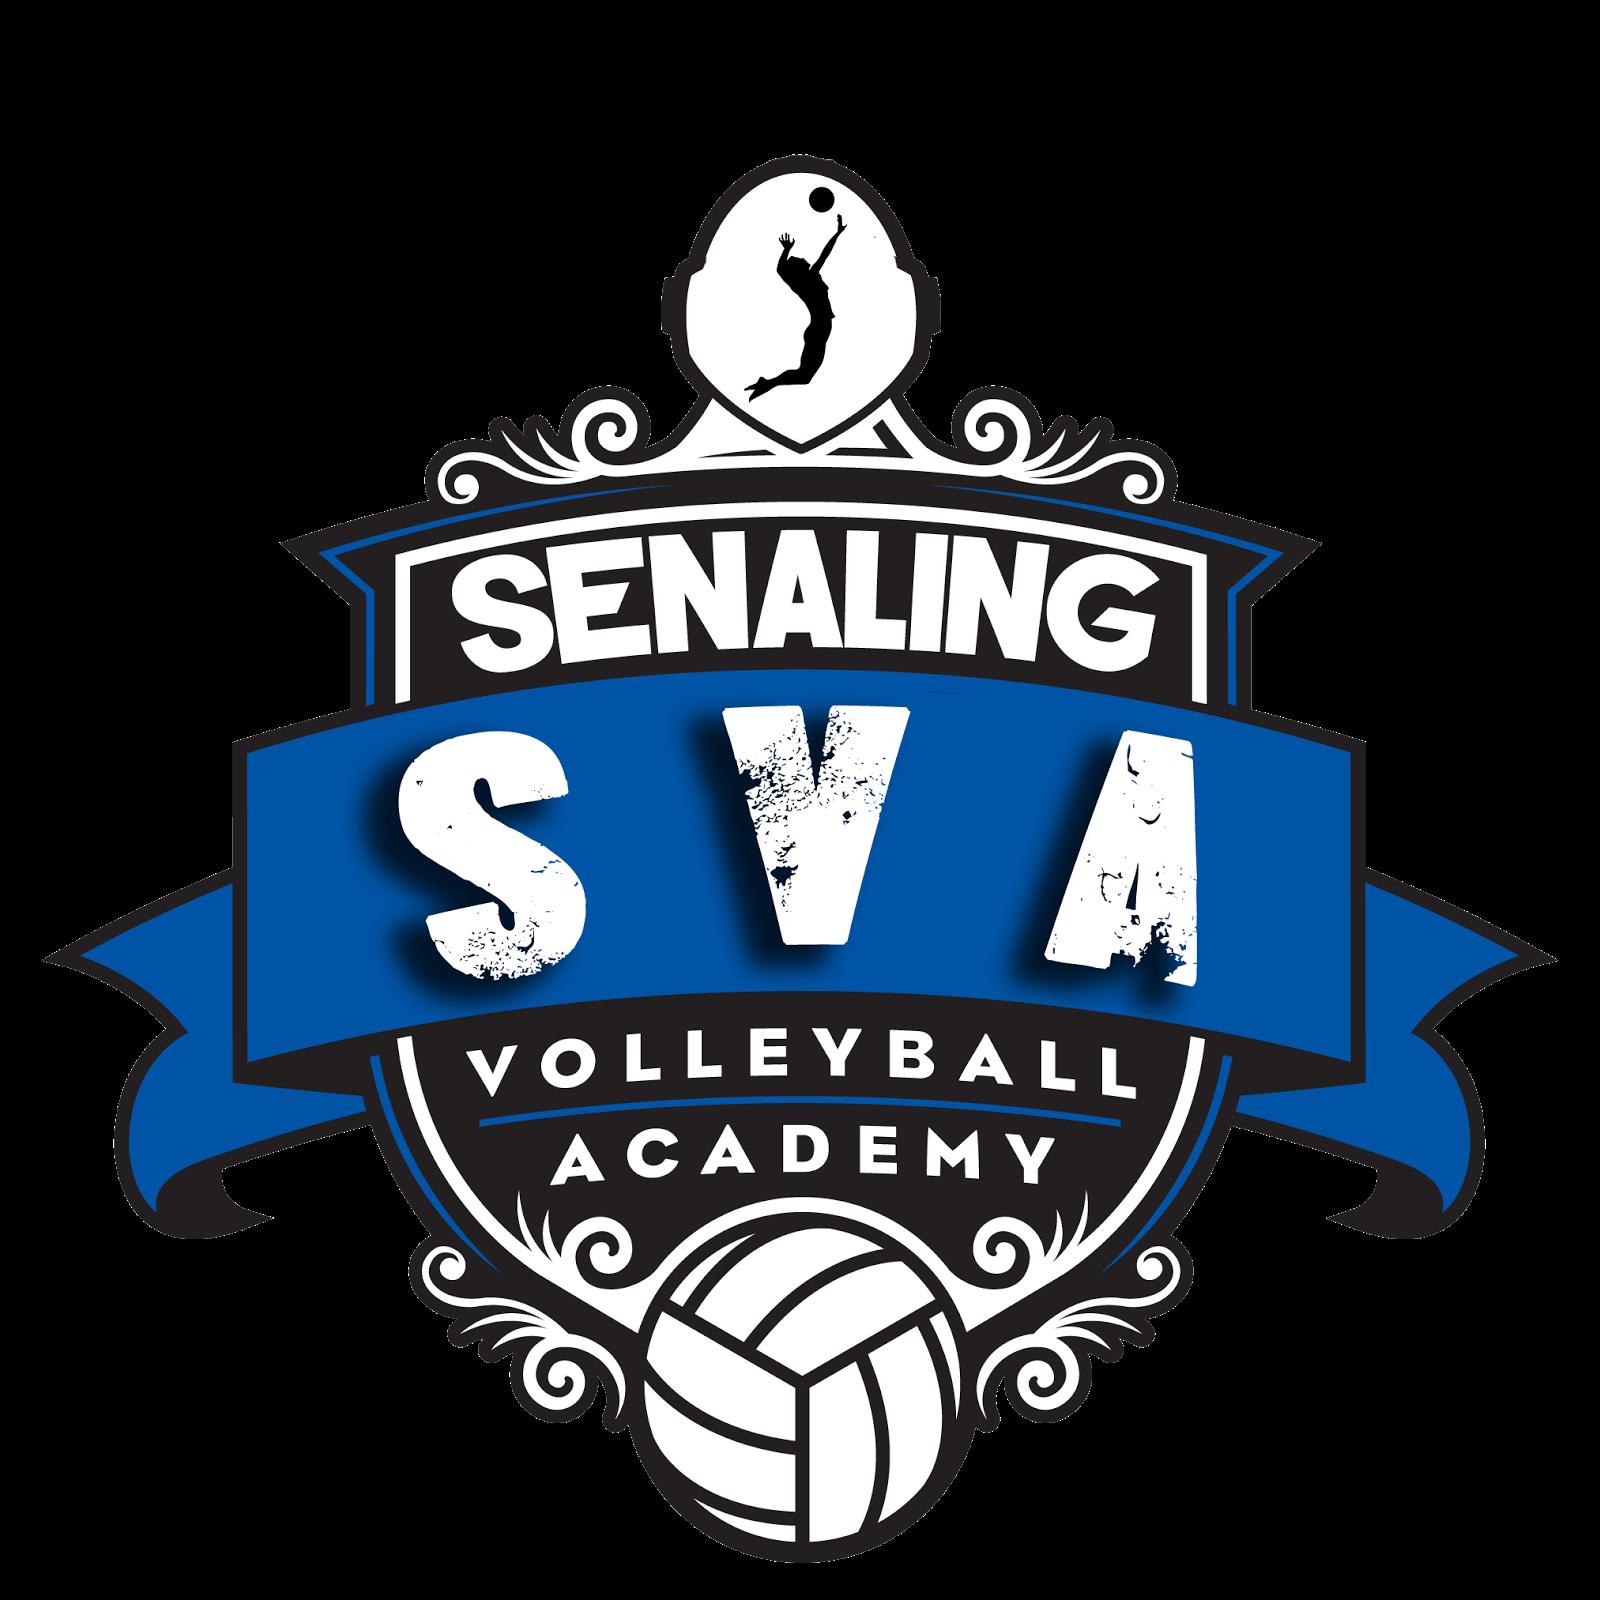 Senaling Volleyball Academy